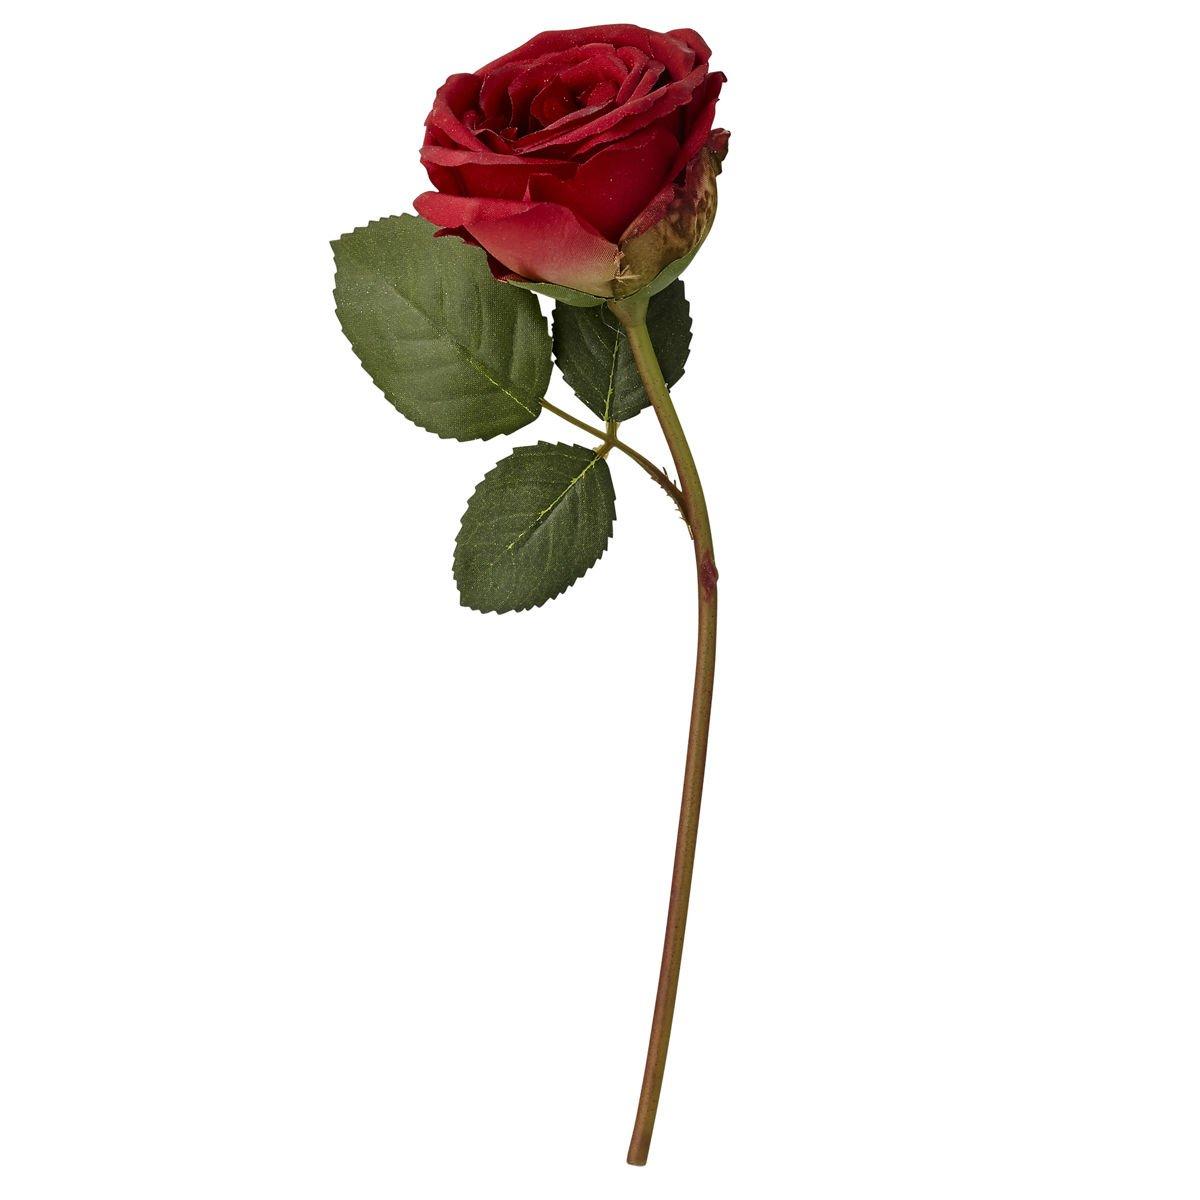 https://www.lilak.com.pl/pol_pl_Roza-kwiat-sztuczny-Lene-Bjerre-9381_2.jpg